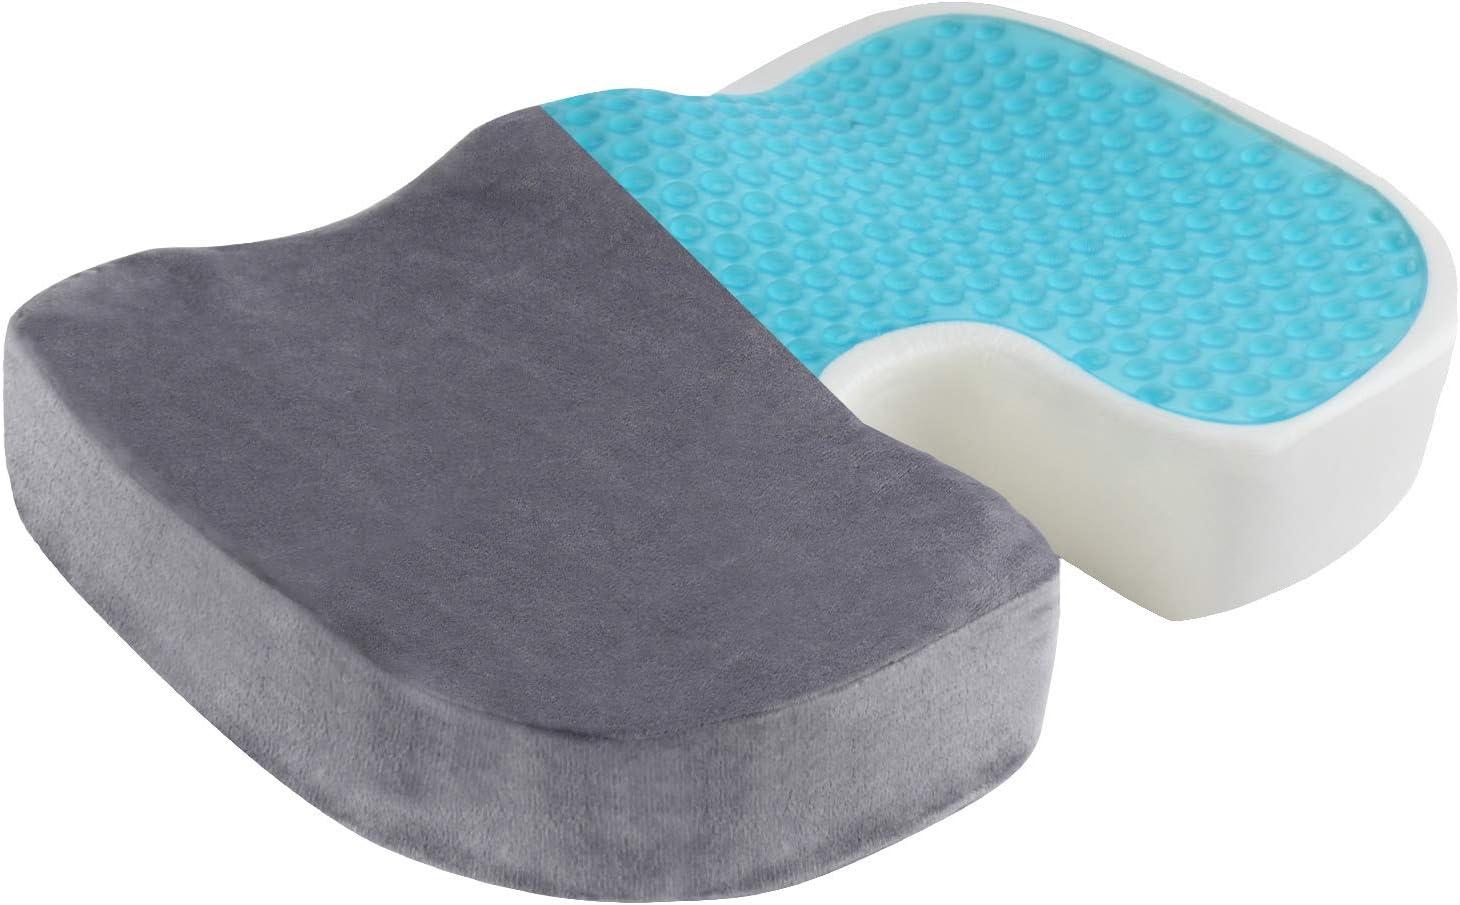 INNO STAGE Gel Enhanced Seat Cushion Comfort Seat Cushion for Office Chair - Non-Slip Car Seat Cushion - Gel & Memory Foam Coccyx Cushion for Tailbone Pain - Sciatica & Back Pain Relief